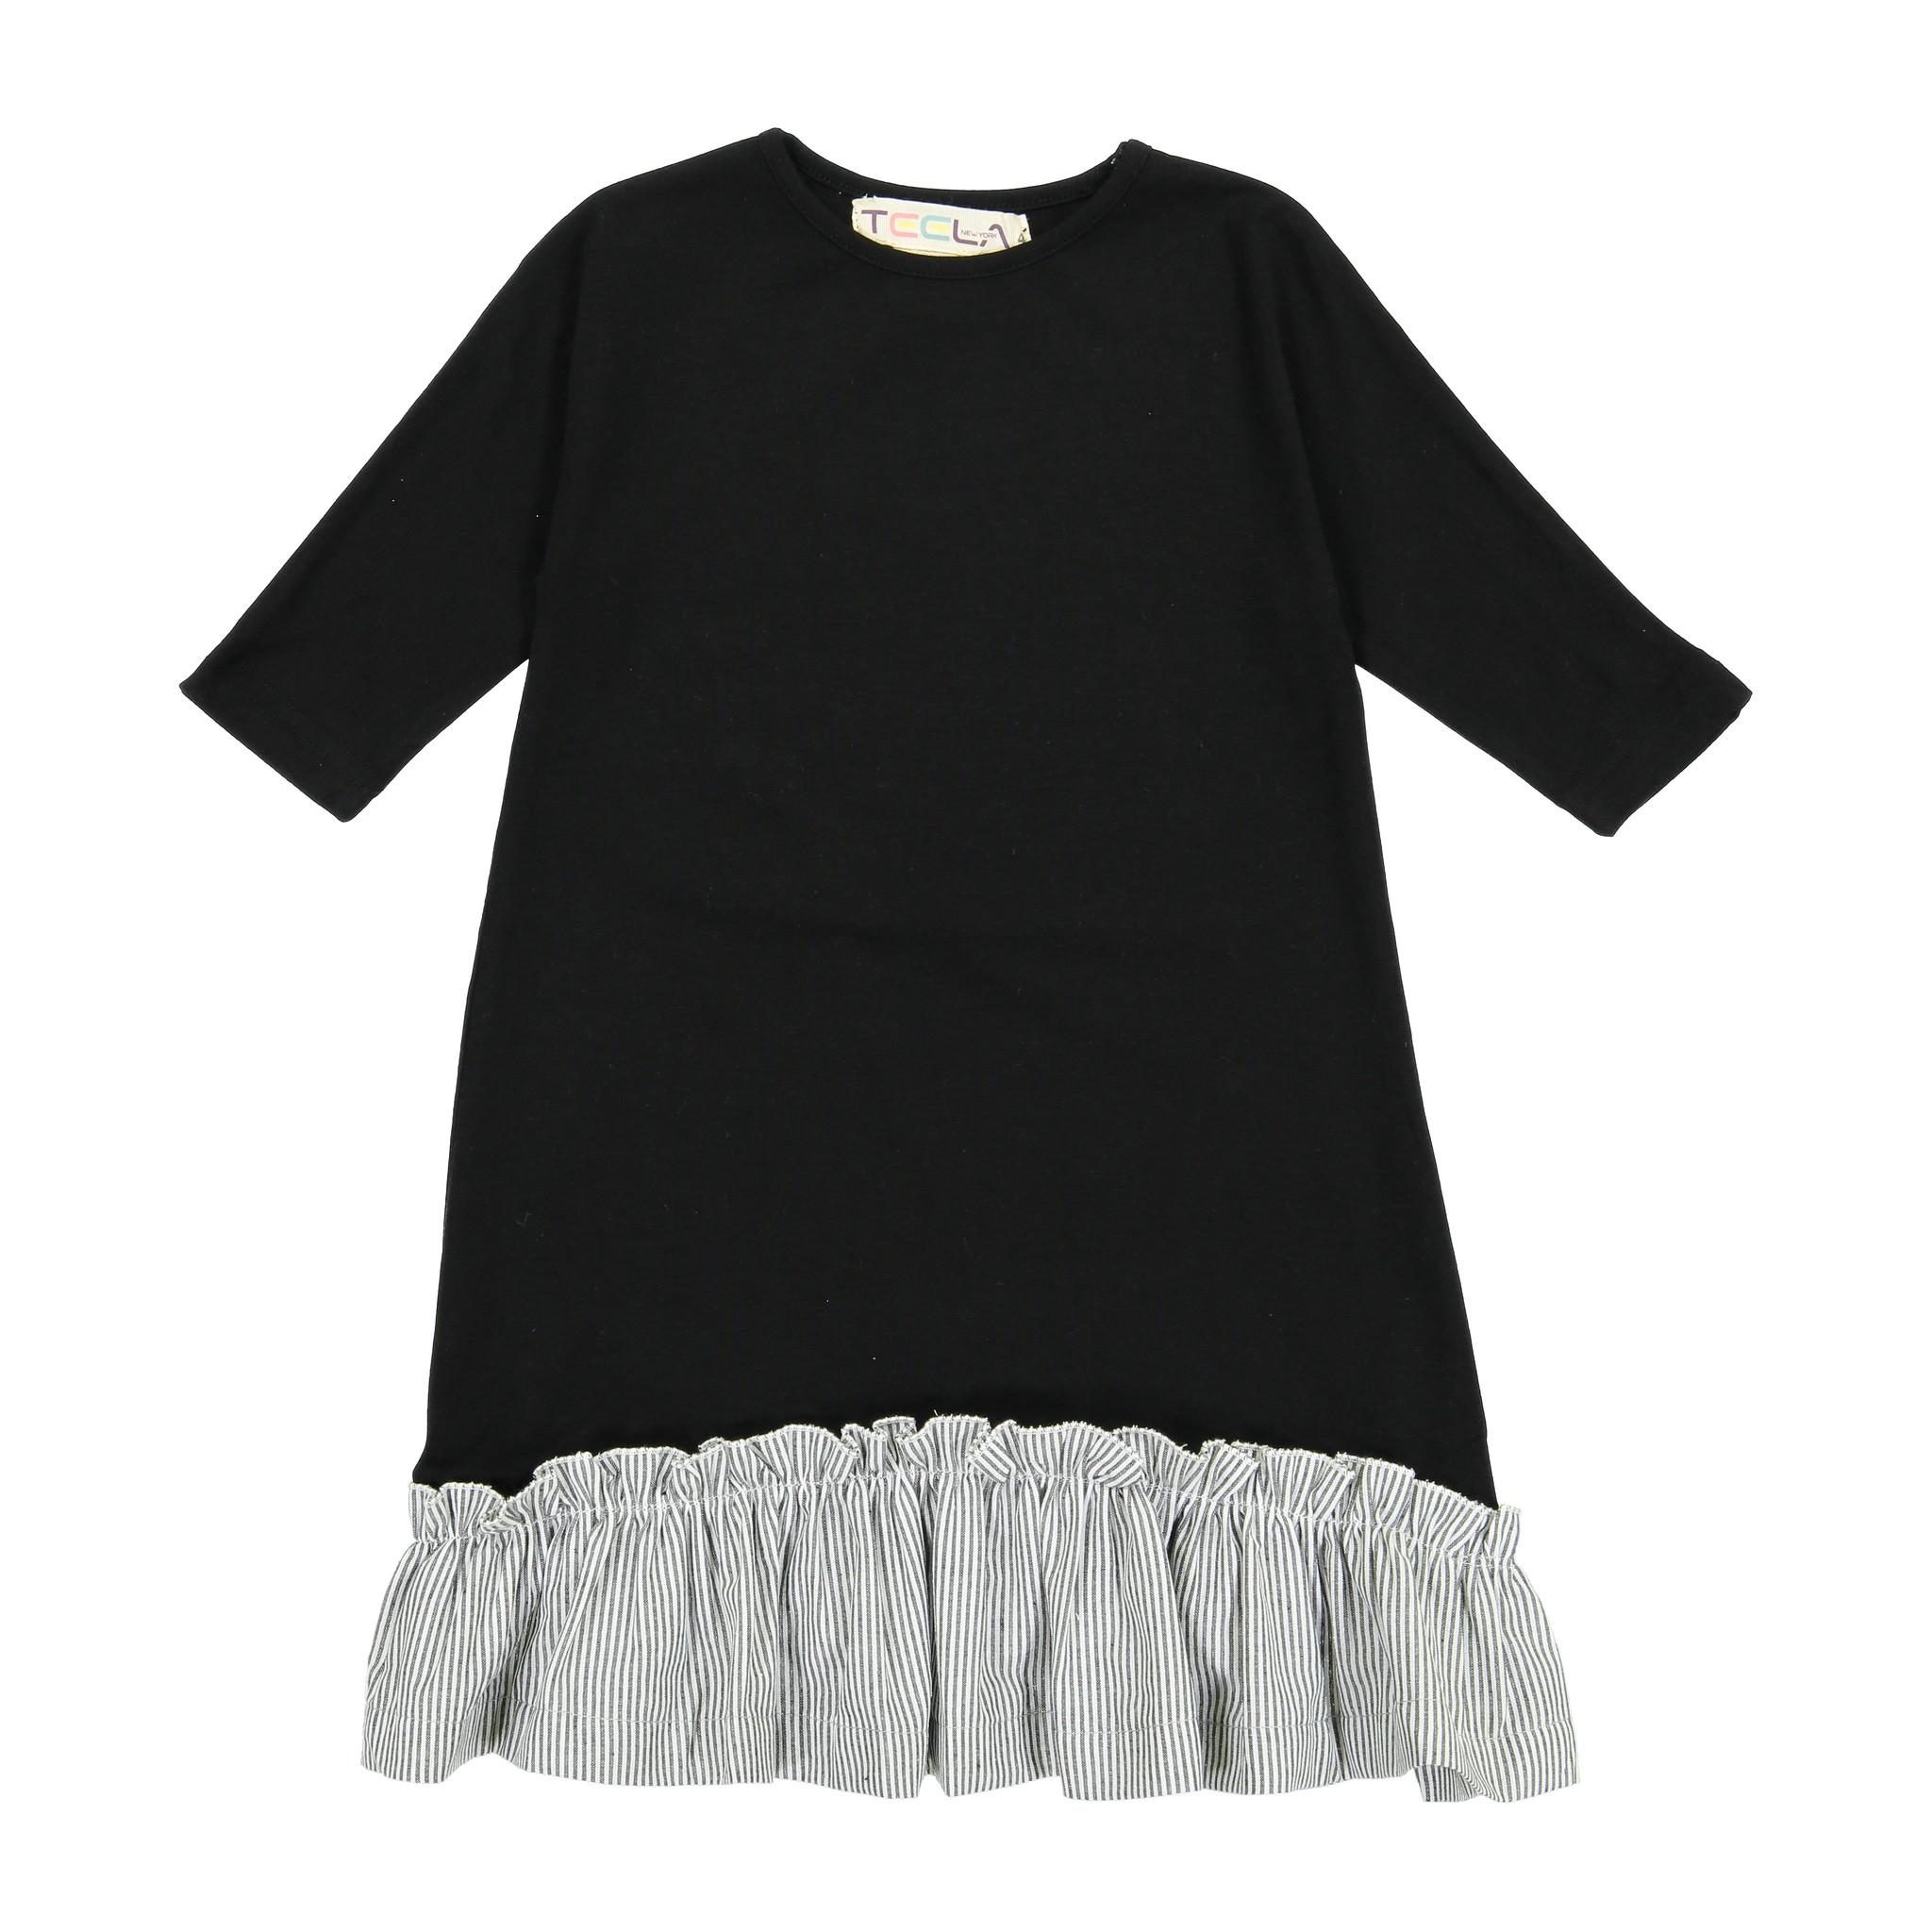 Teela BOTTOM RUFFLE Pinstripe Dress Black